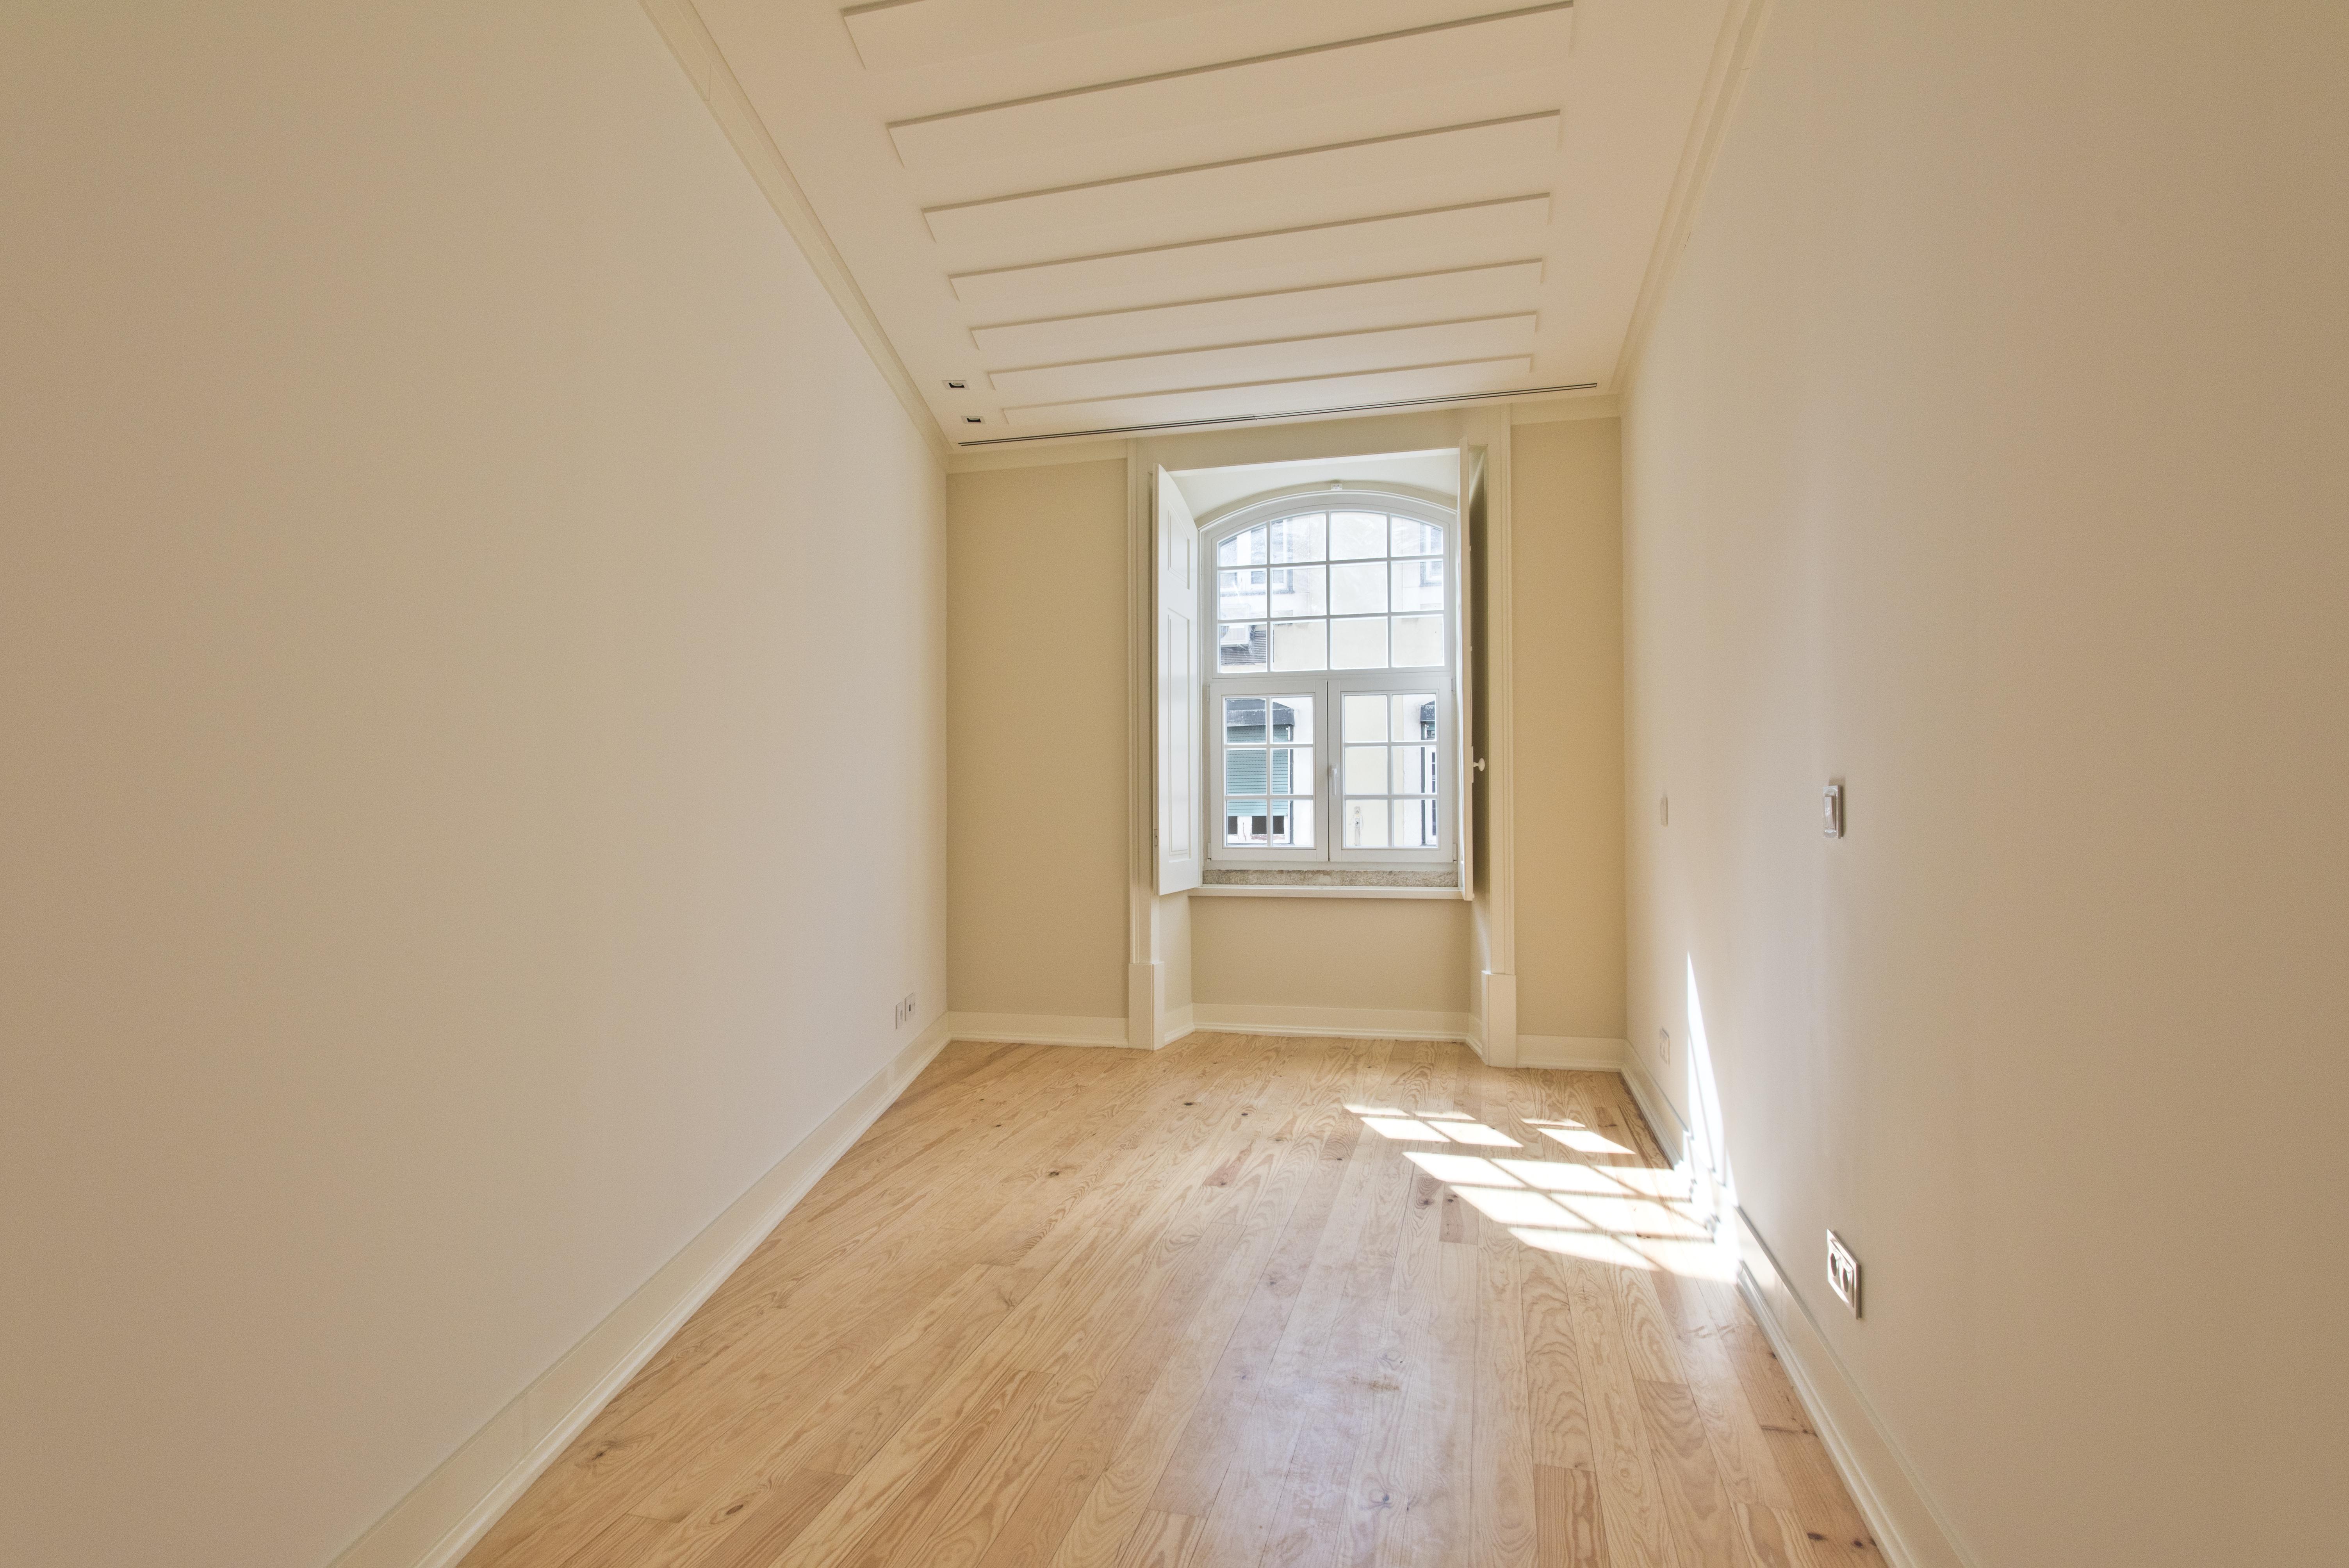 renaissance-chiado-apartments-37